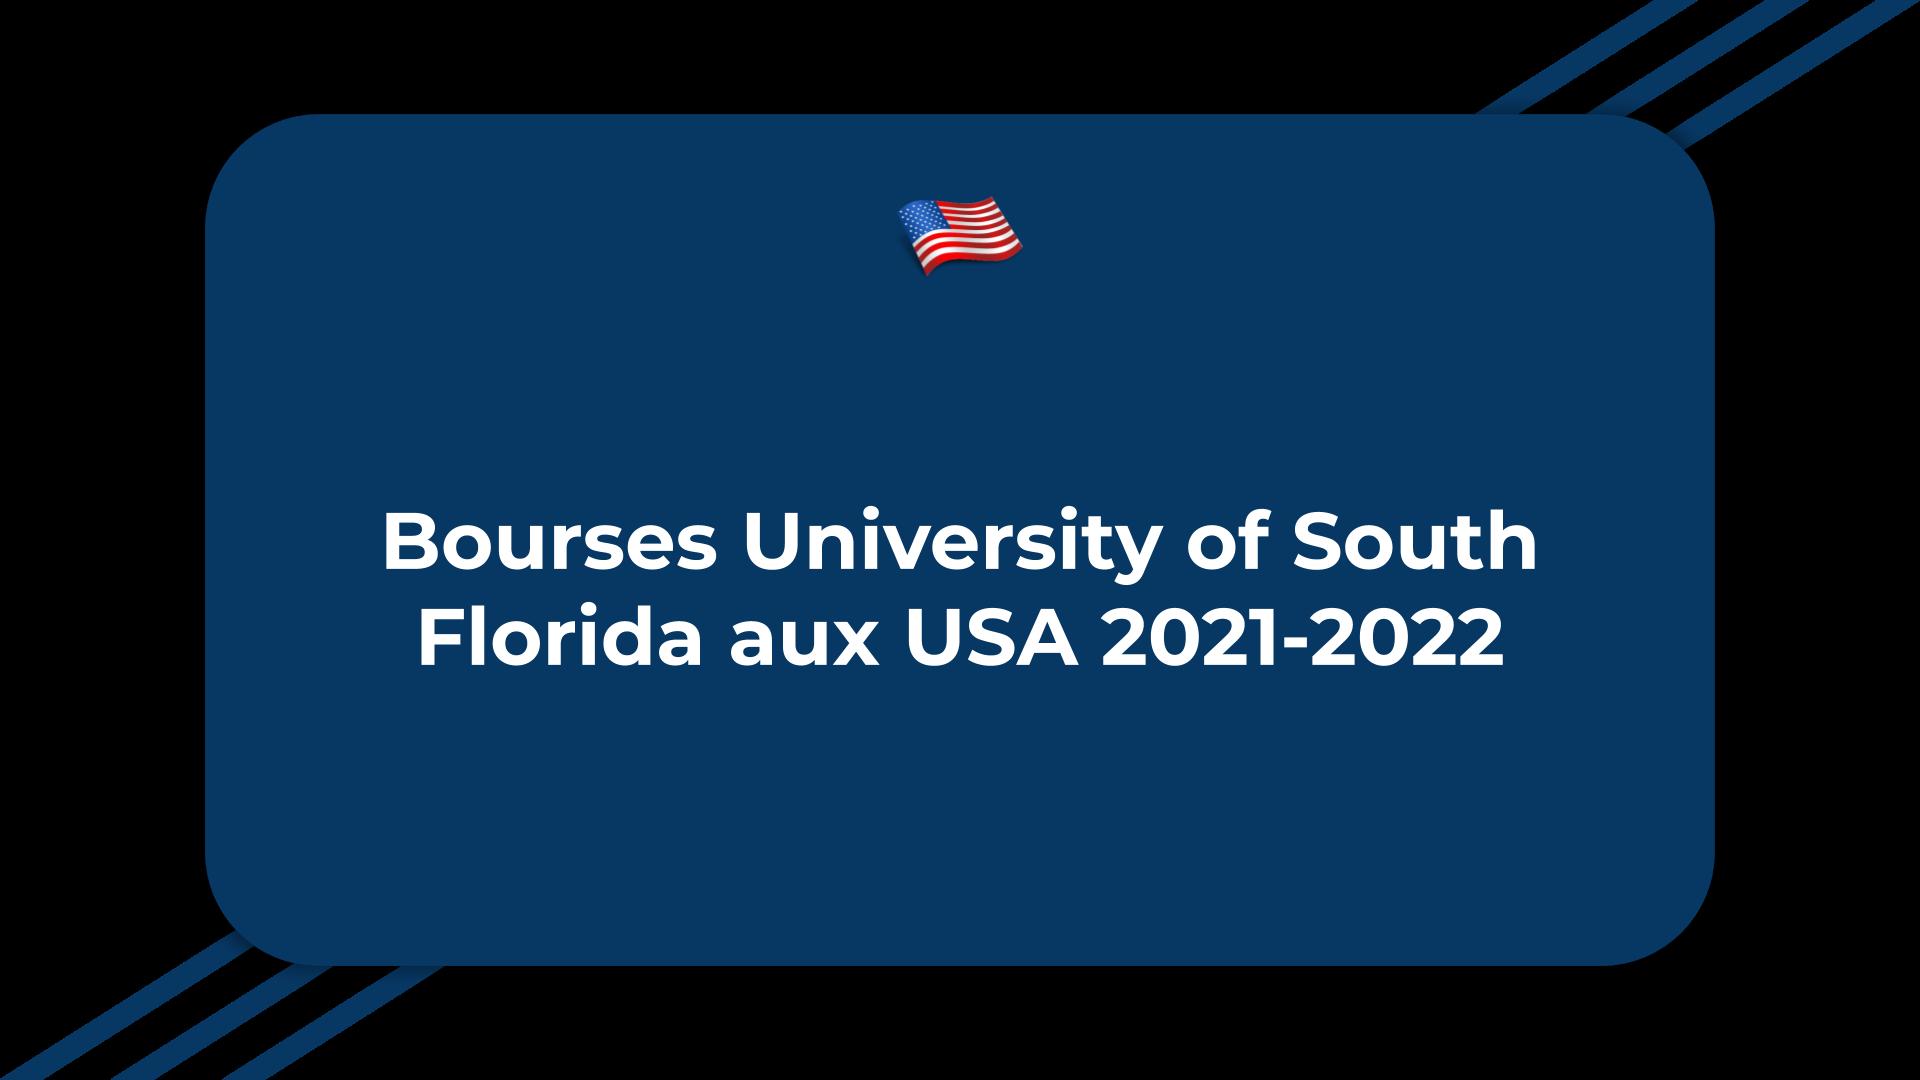 Bourses University of South Florida